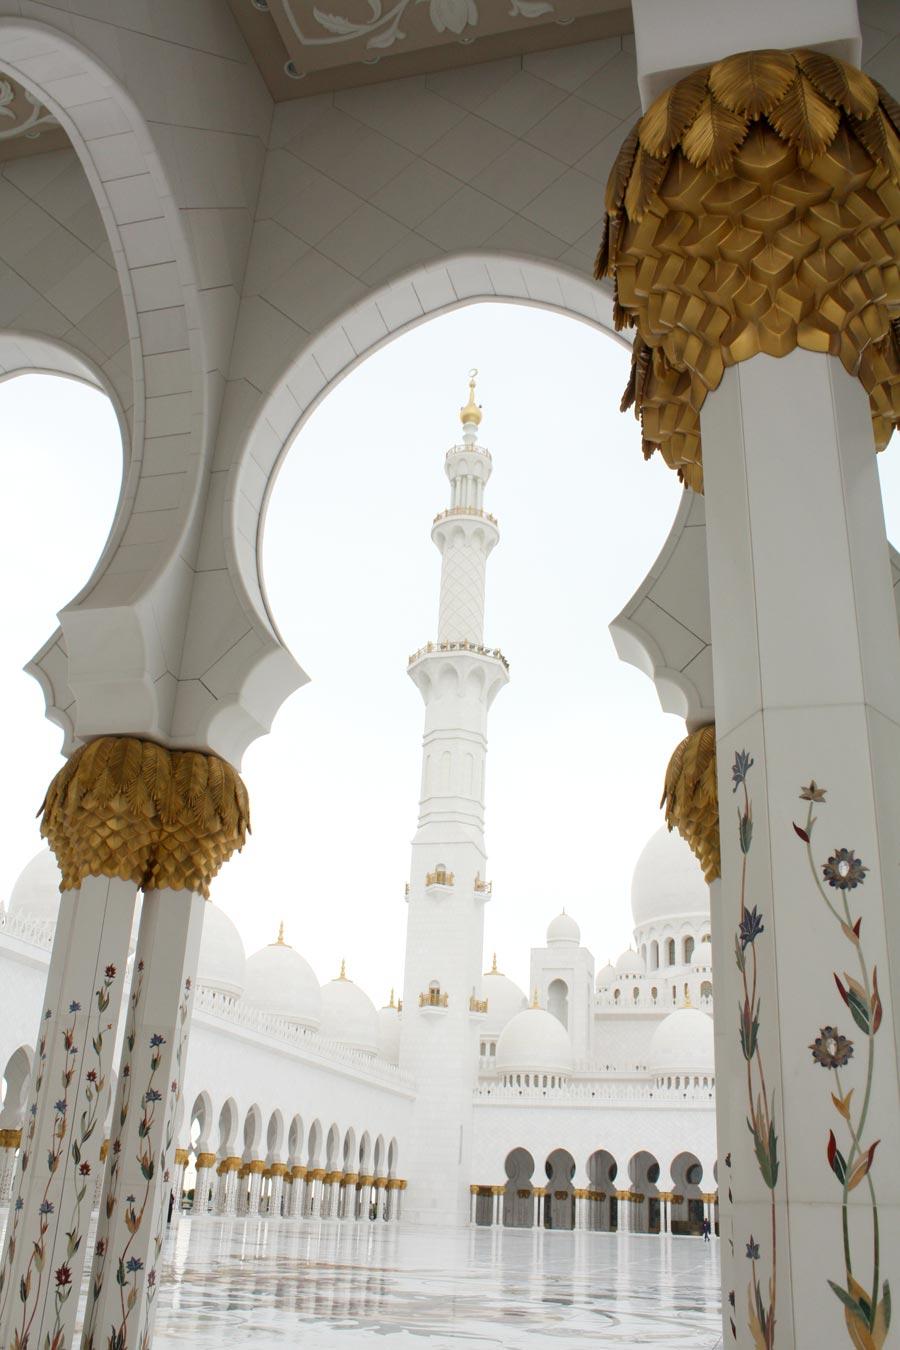 Abu Dhabi Sheikh Zayed Palm Minaret